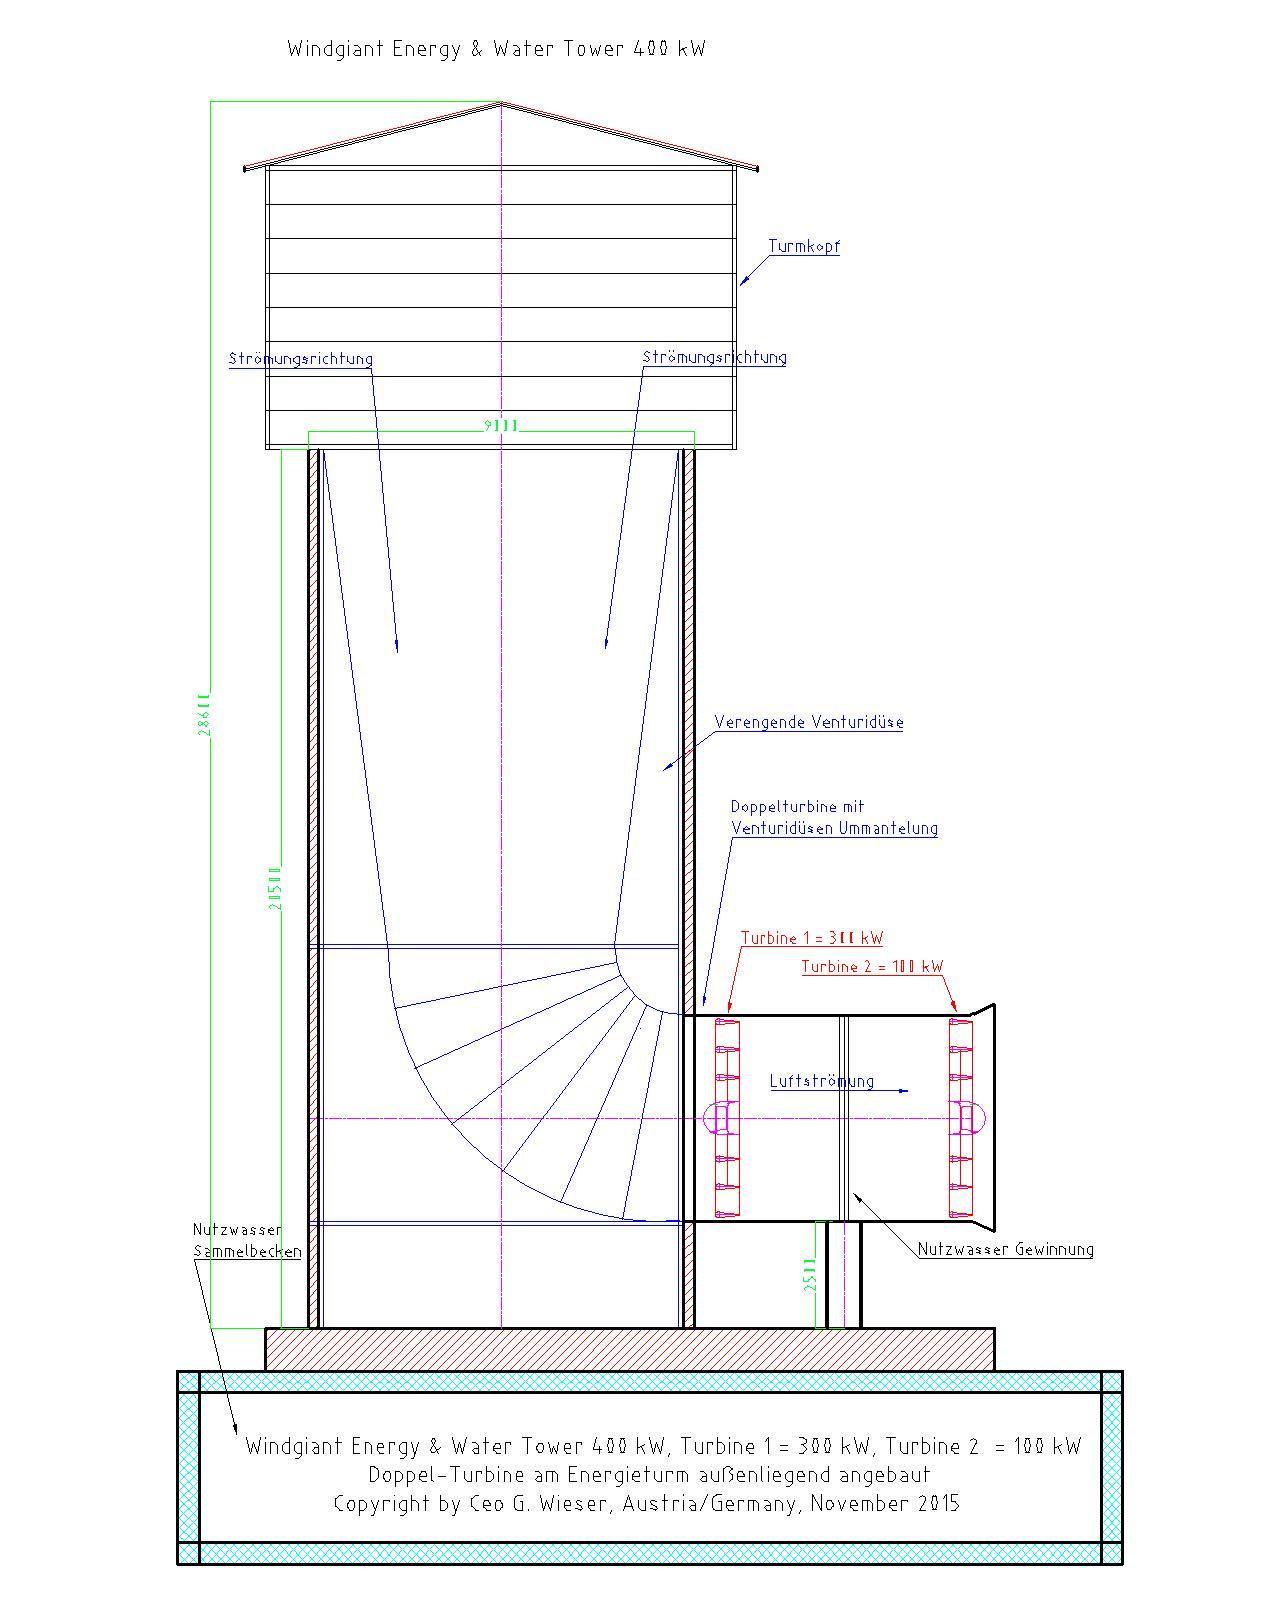 Energieturm-400_kW-_23.Nov.2015